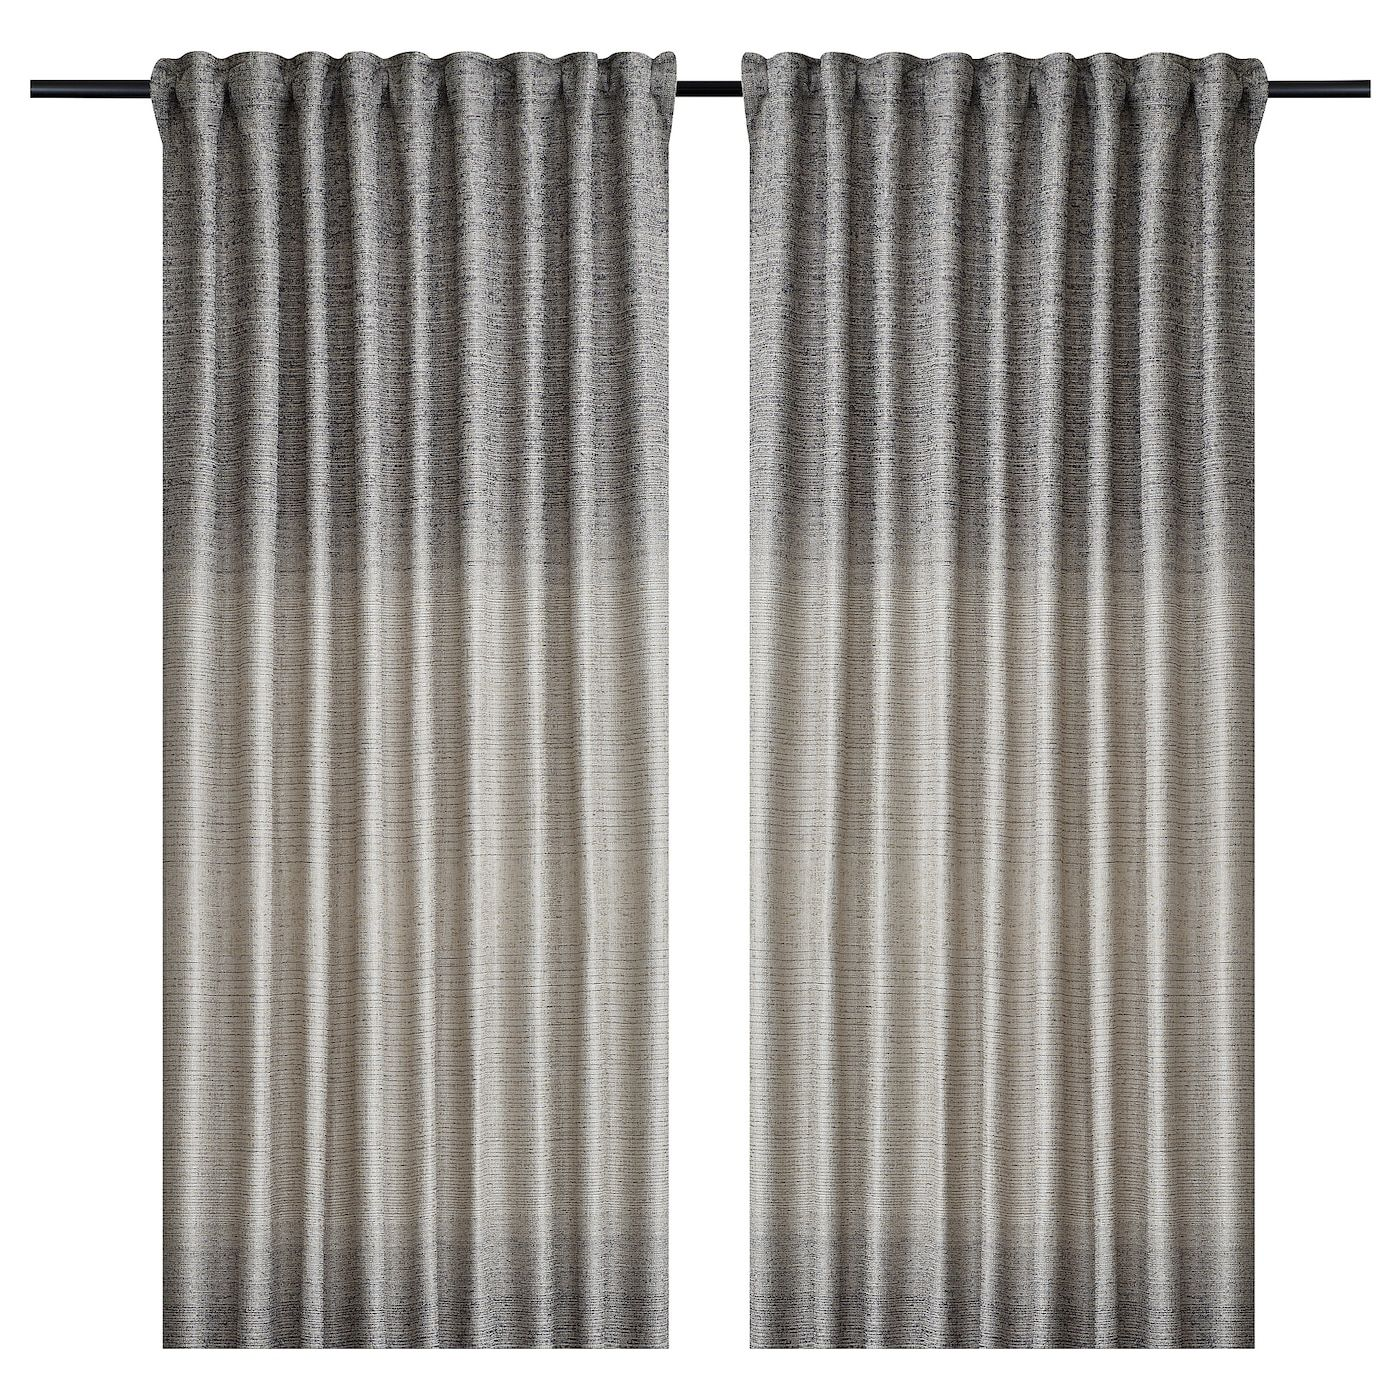 Ikea Bjarnhild Beige Curtains 1 Pair Curtains Cool Curtains Ikea